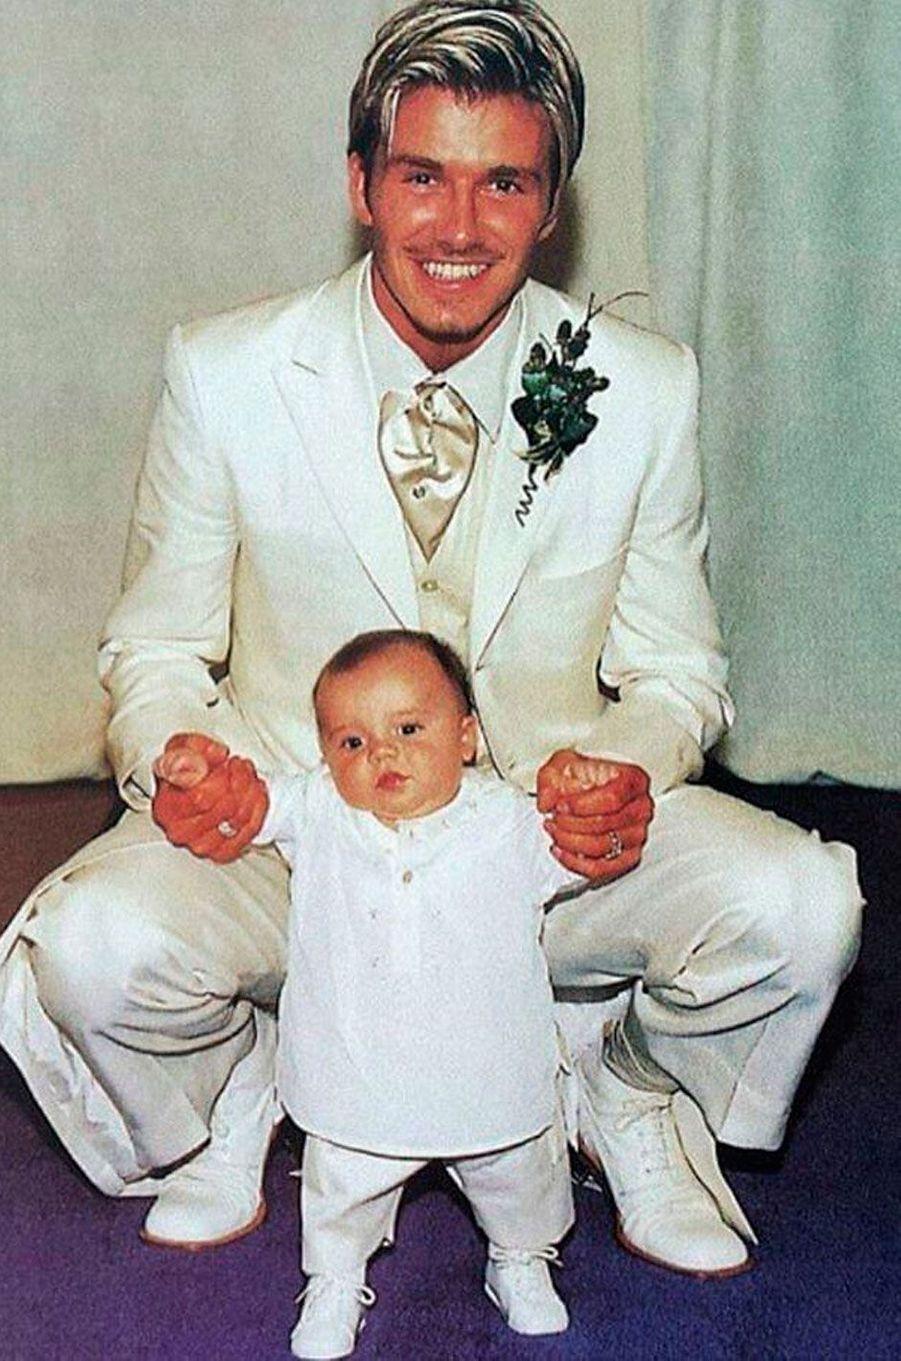 Brooklyn Beckham et son père, David